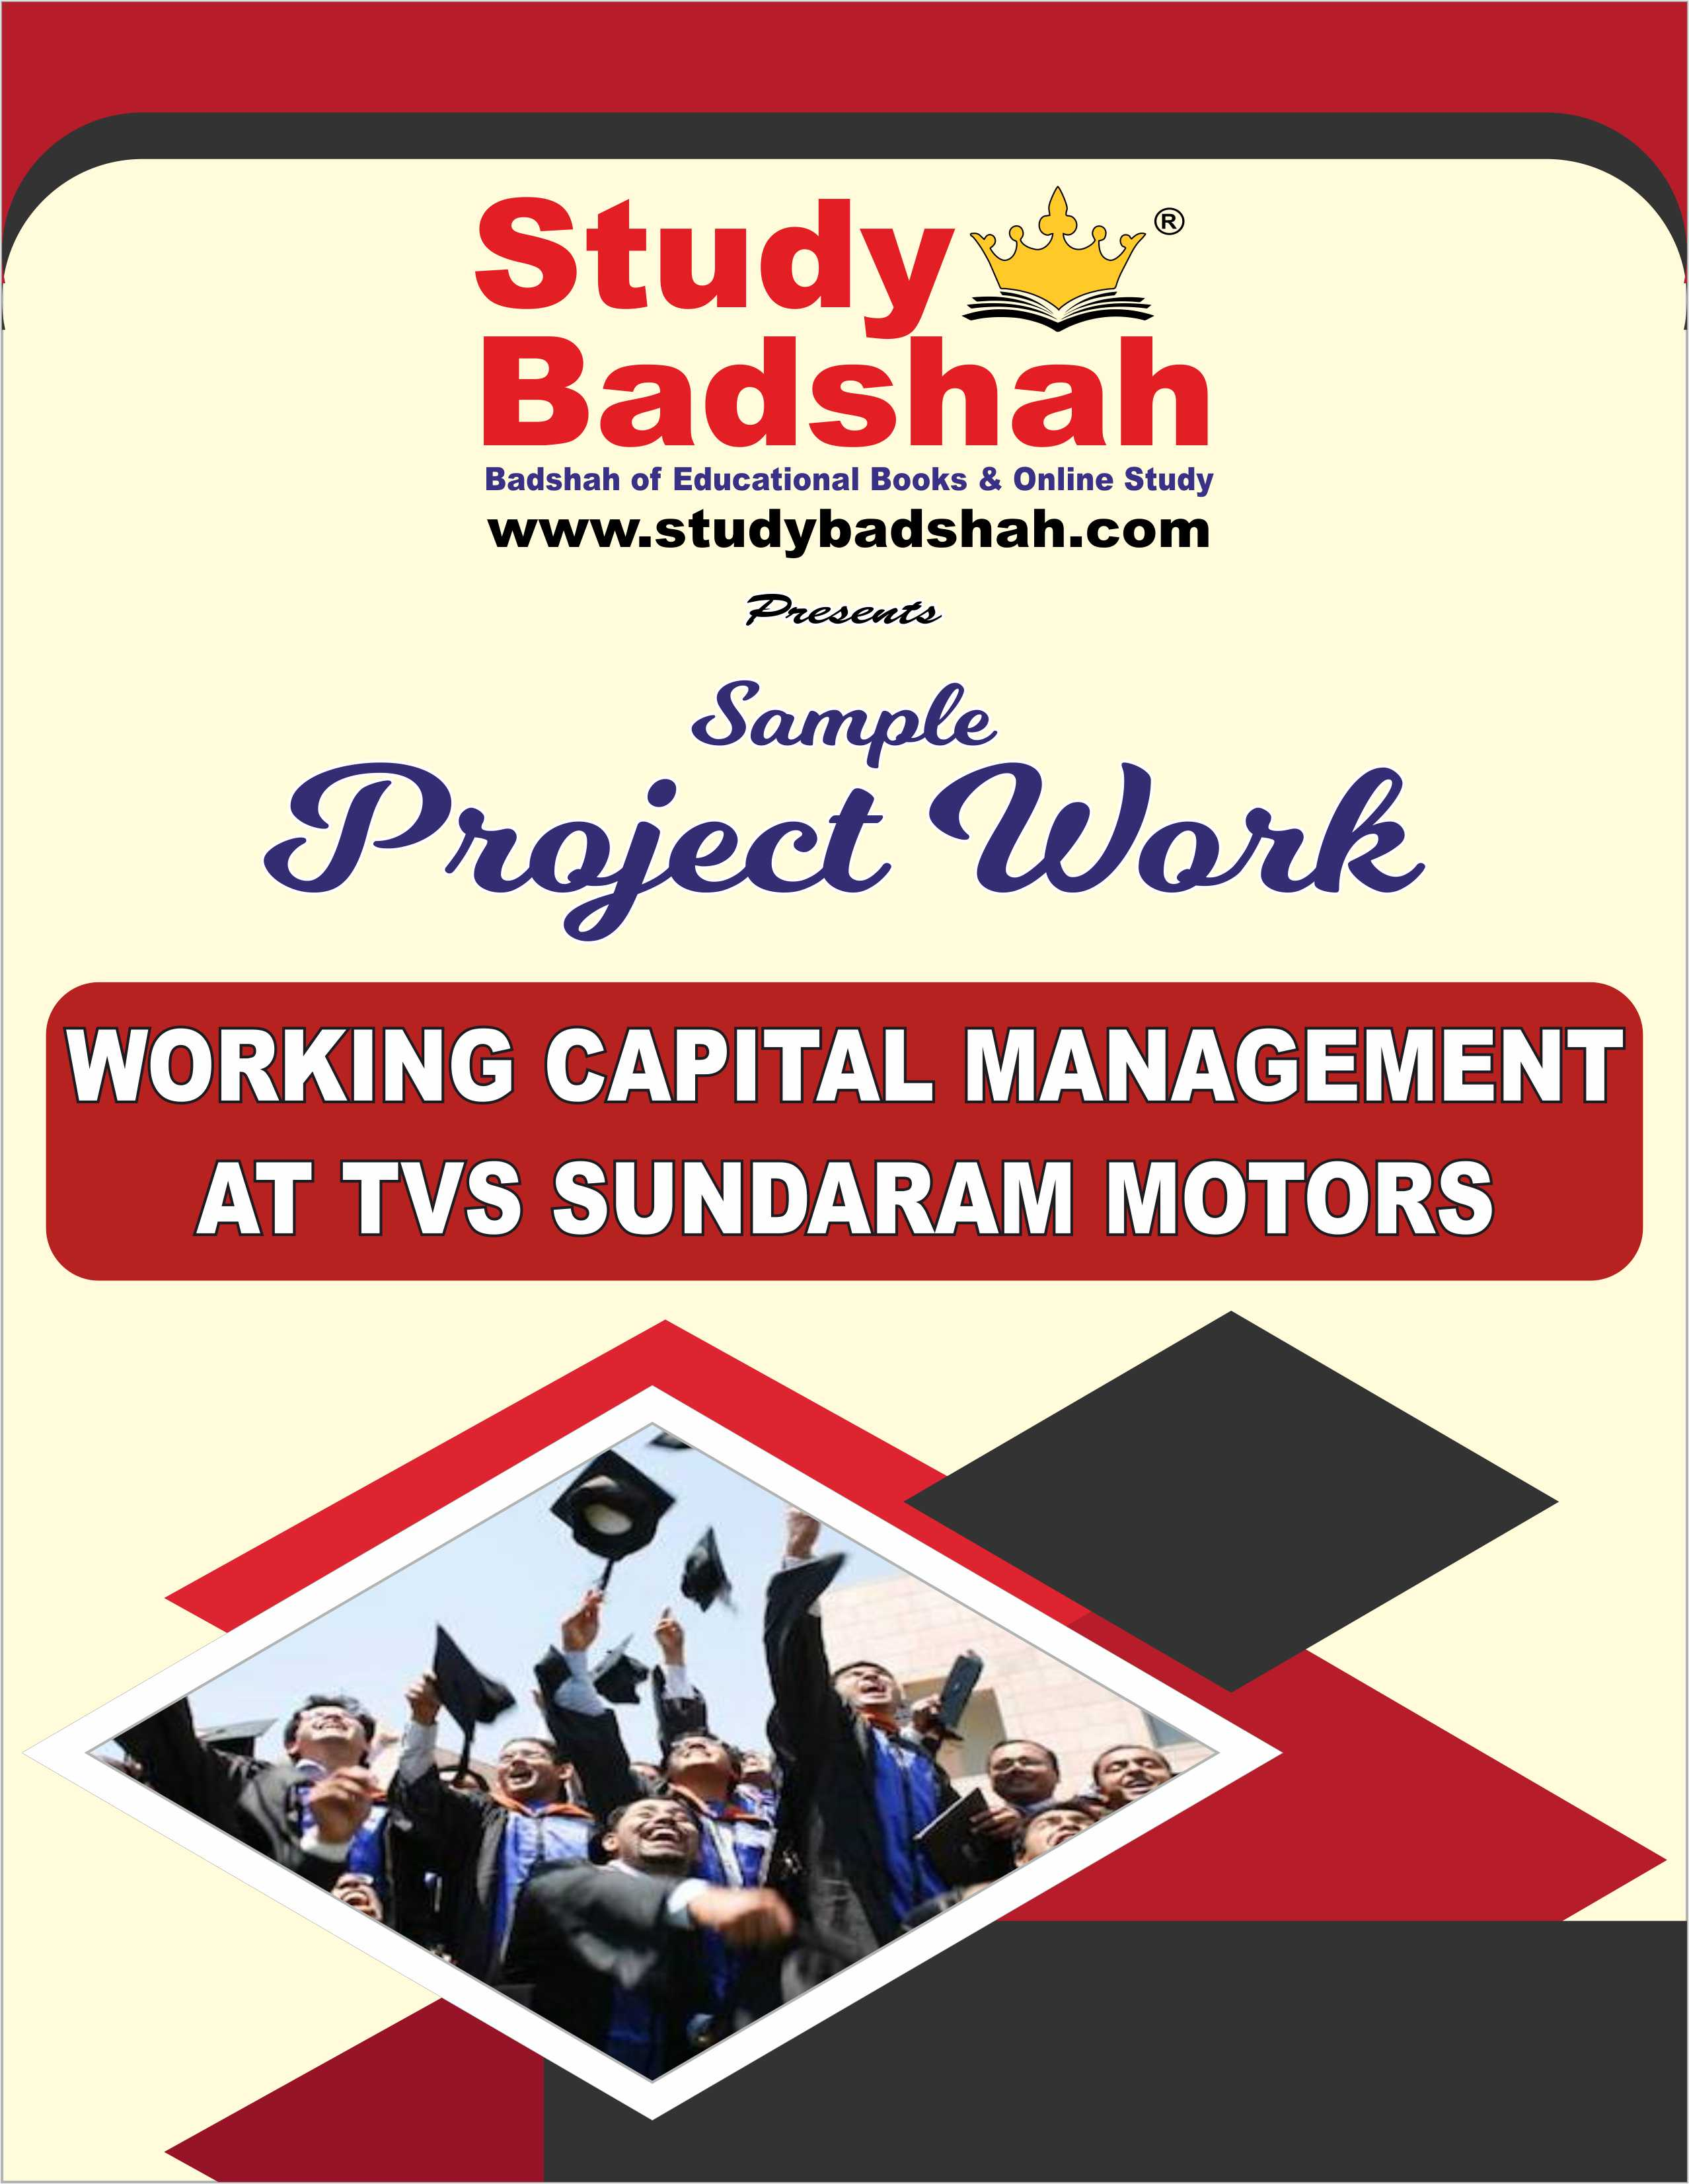 Working Capital Management at TVS Sundaram Motors